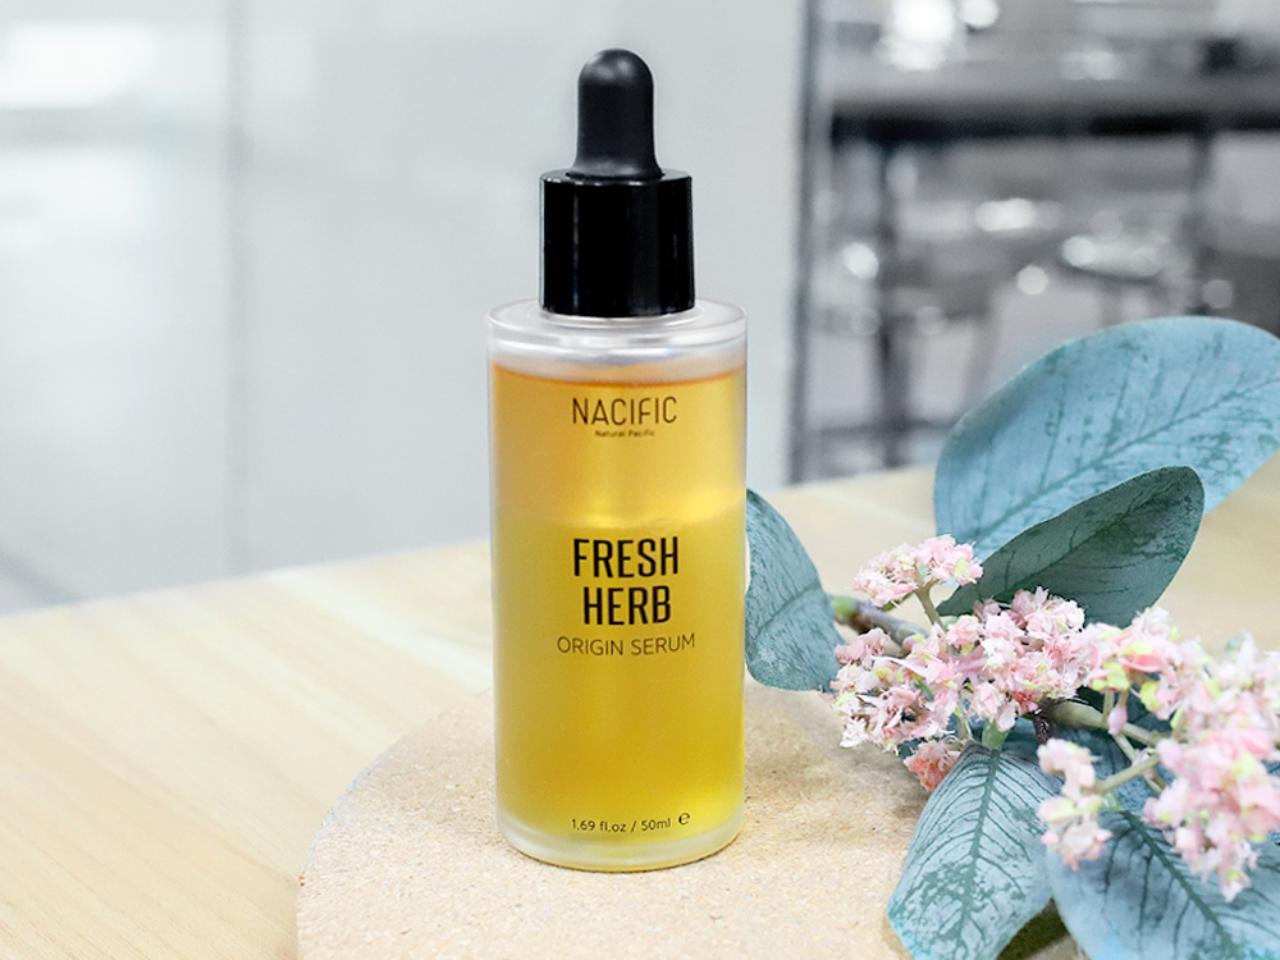 Nacific Fresh Herb Origin Serum Rahasia Wajah Cantik Memesona